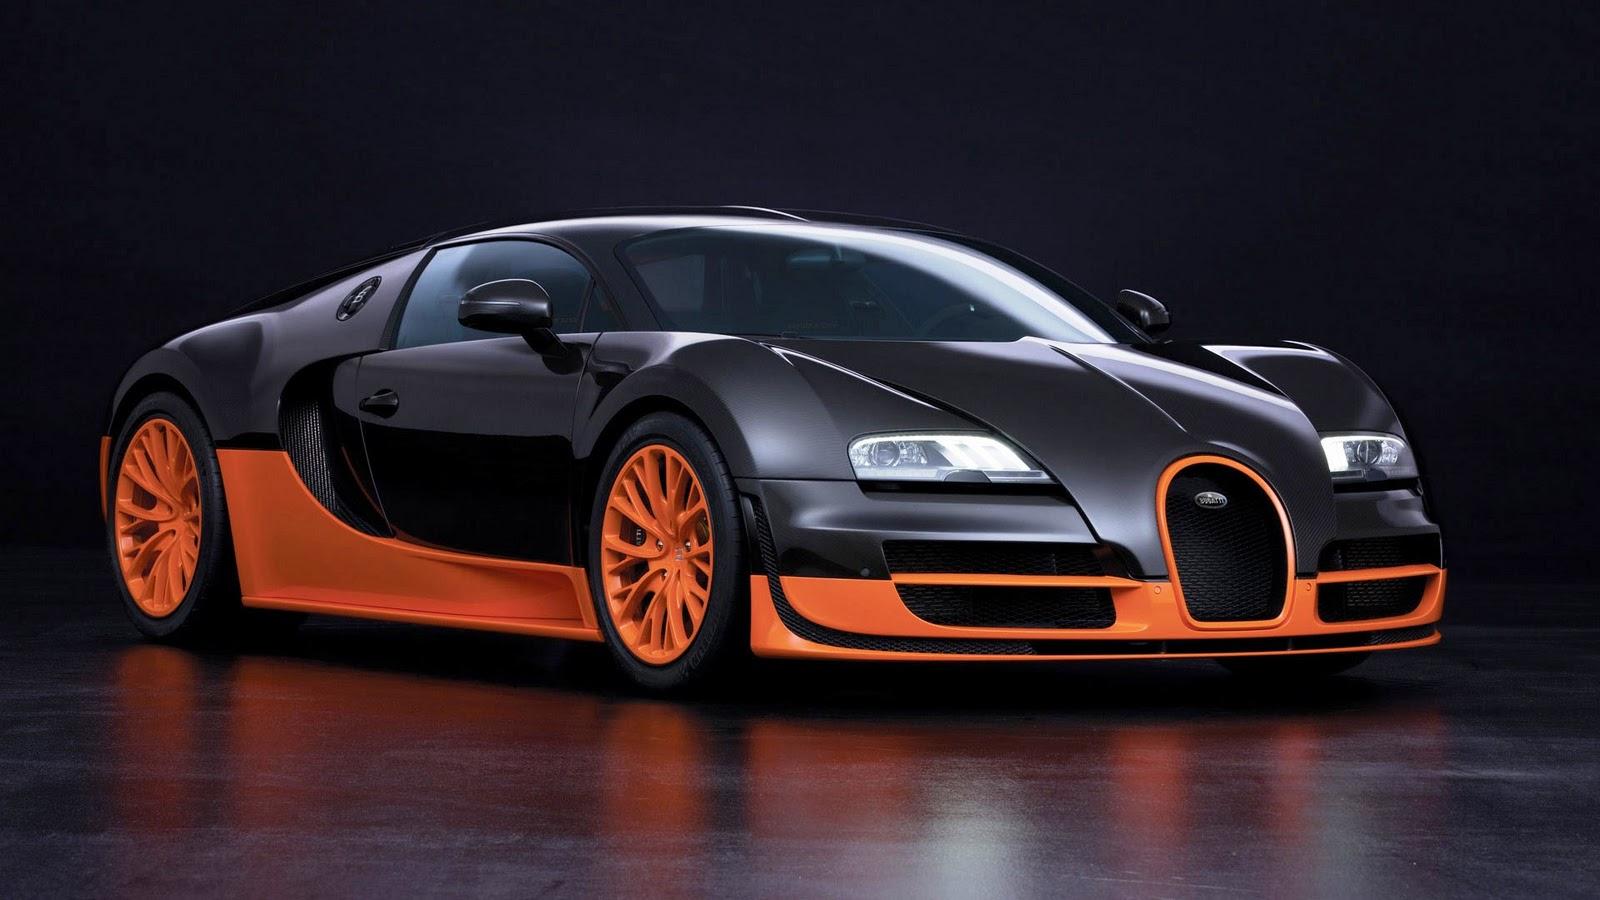 Full HD Exotic Car Wallpapers: 2011 Bugatti Veyron 16.4